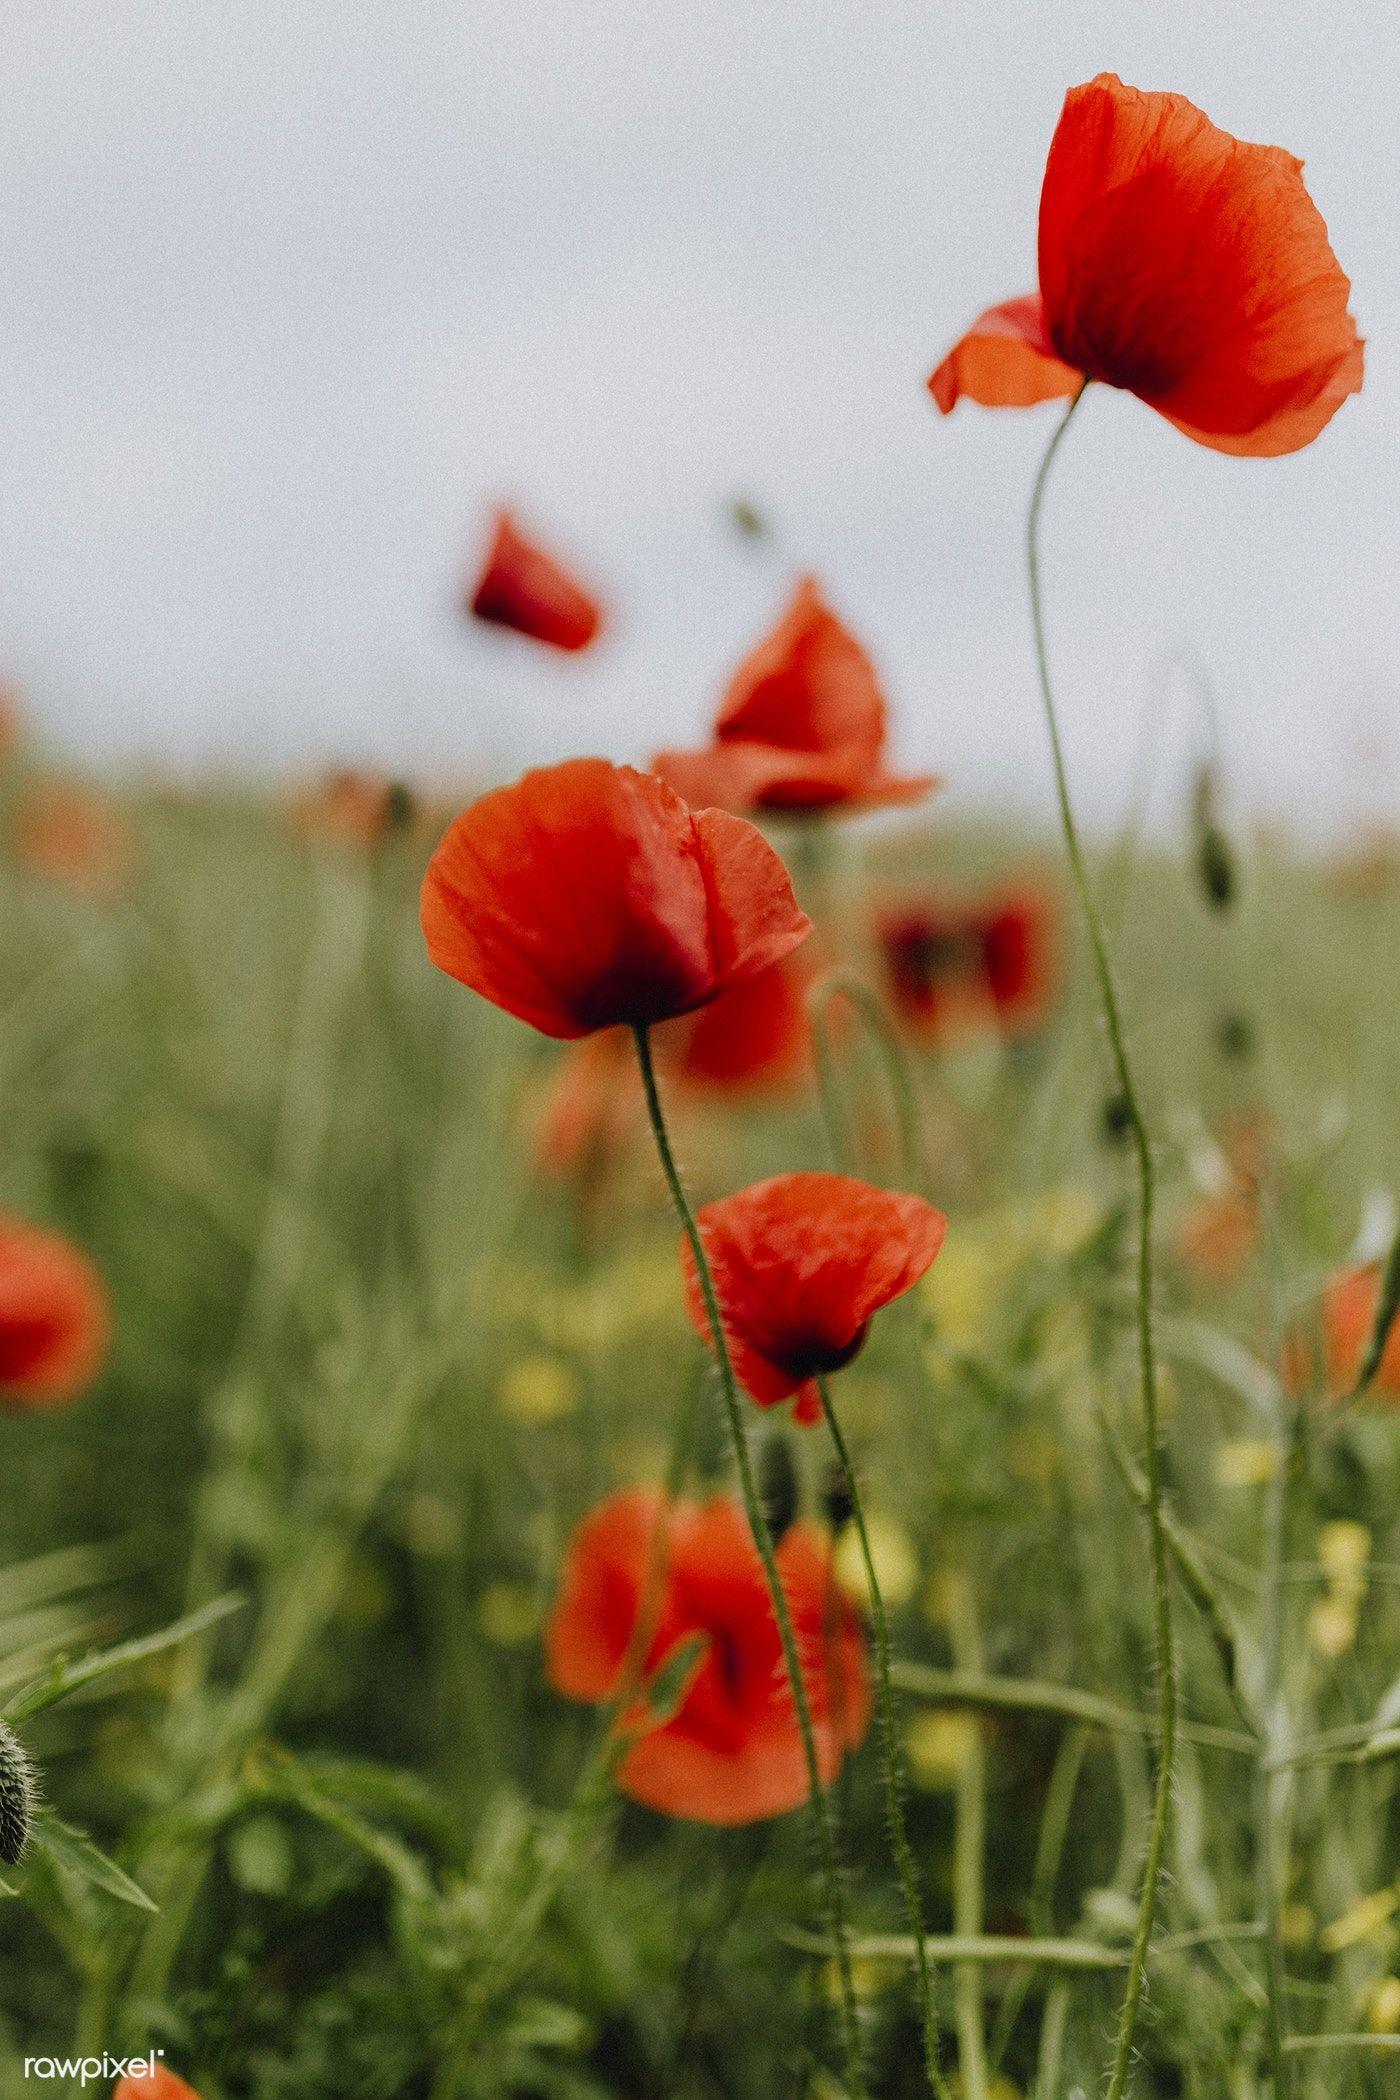 Field Of Poppy Flowers Free Image By Rawpixel Karolina